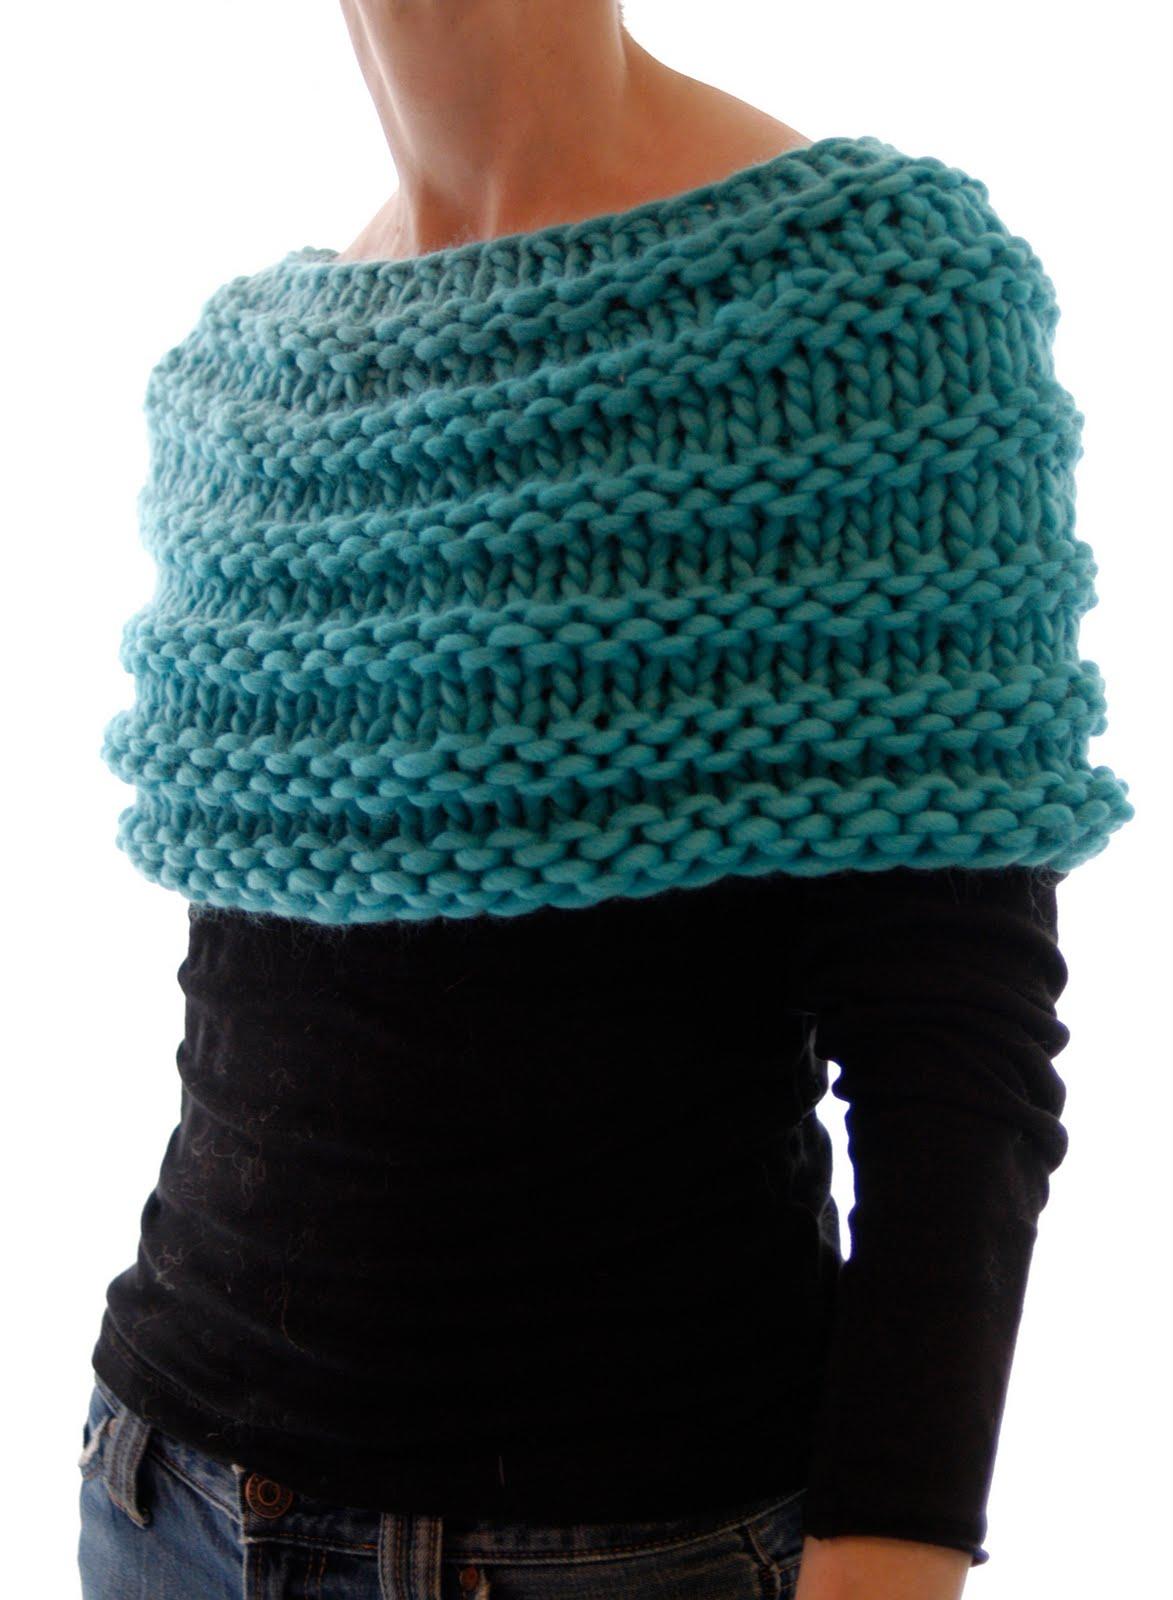 Knit 1 LA: Knitting: Premium Patterns